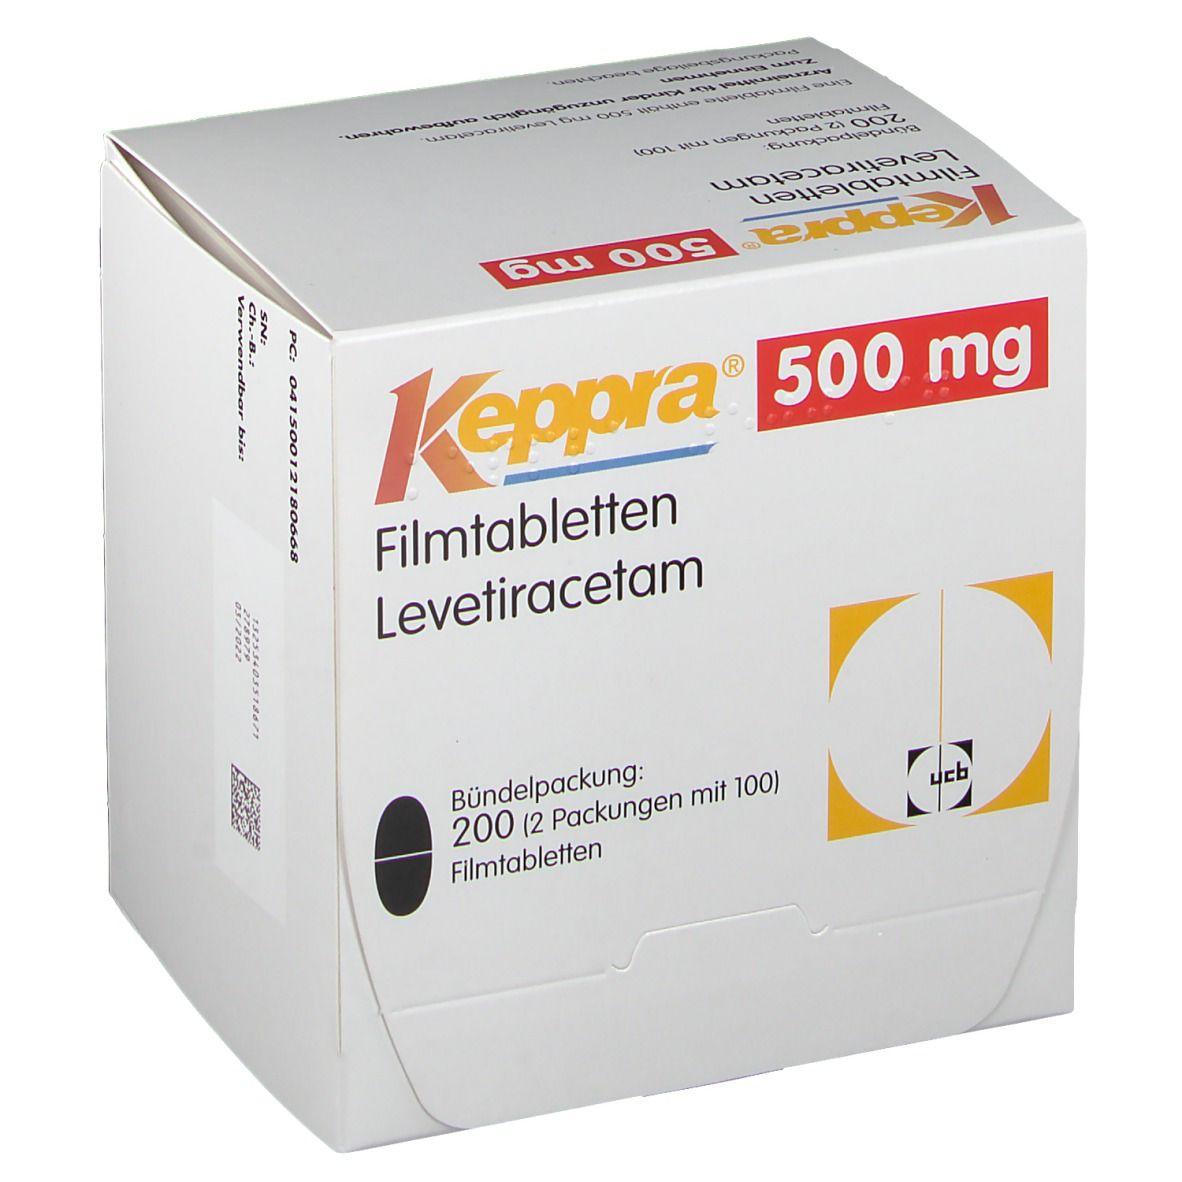 Keppra 500 mg Filmtabl.